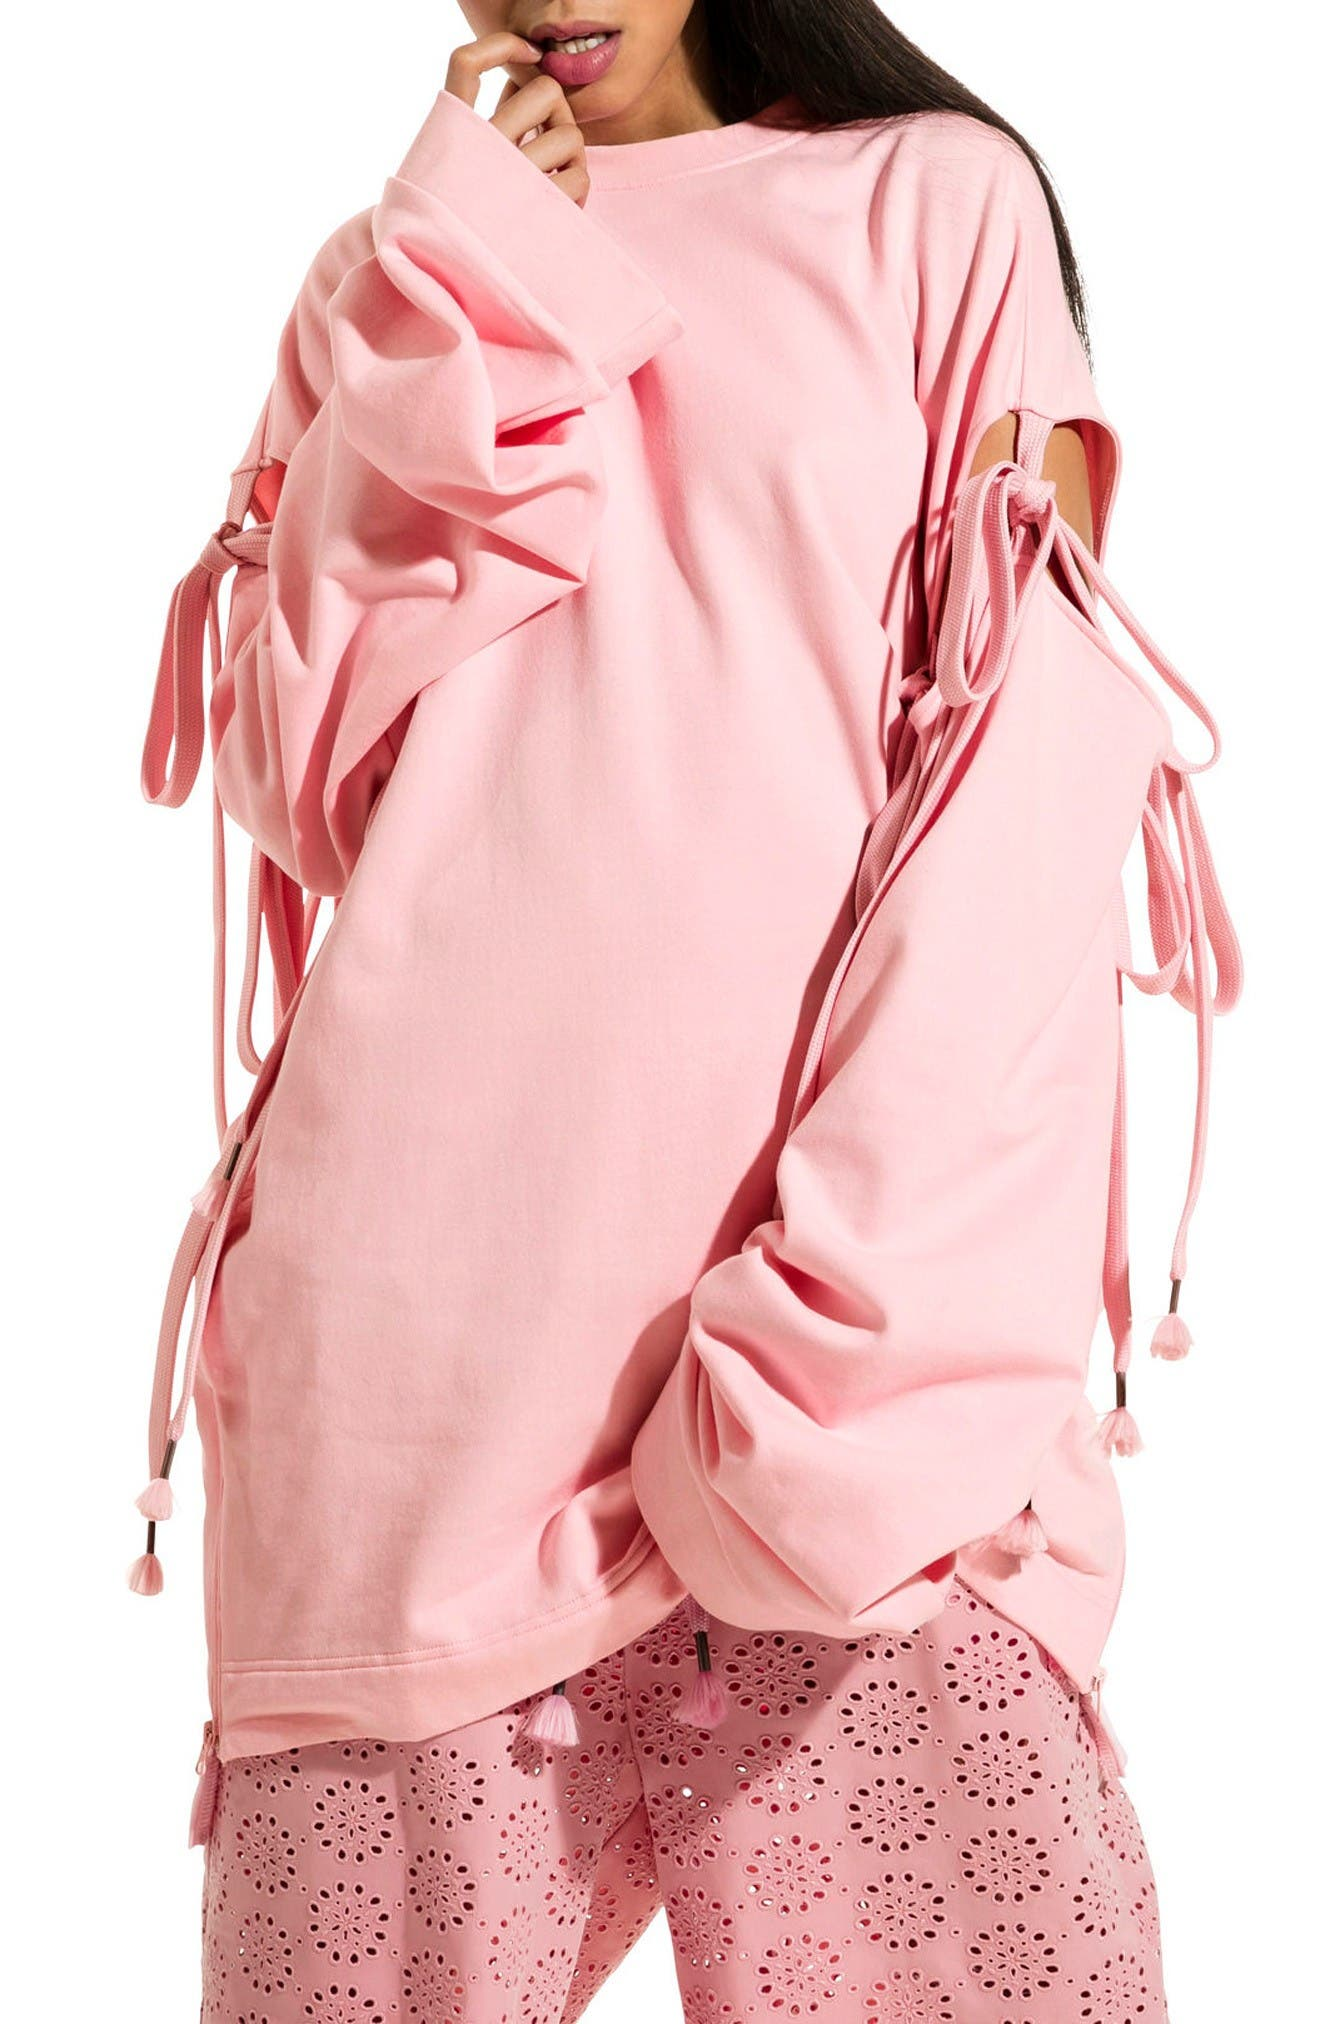 Alternate Image 1 Selected - FENTY PUMA by Rihanna Oversize Convertible Sleeve Sweatshirt